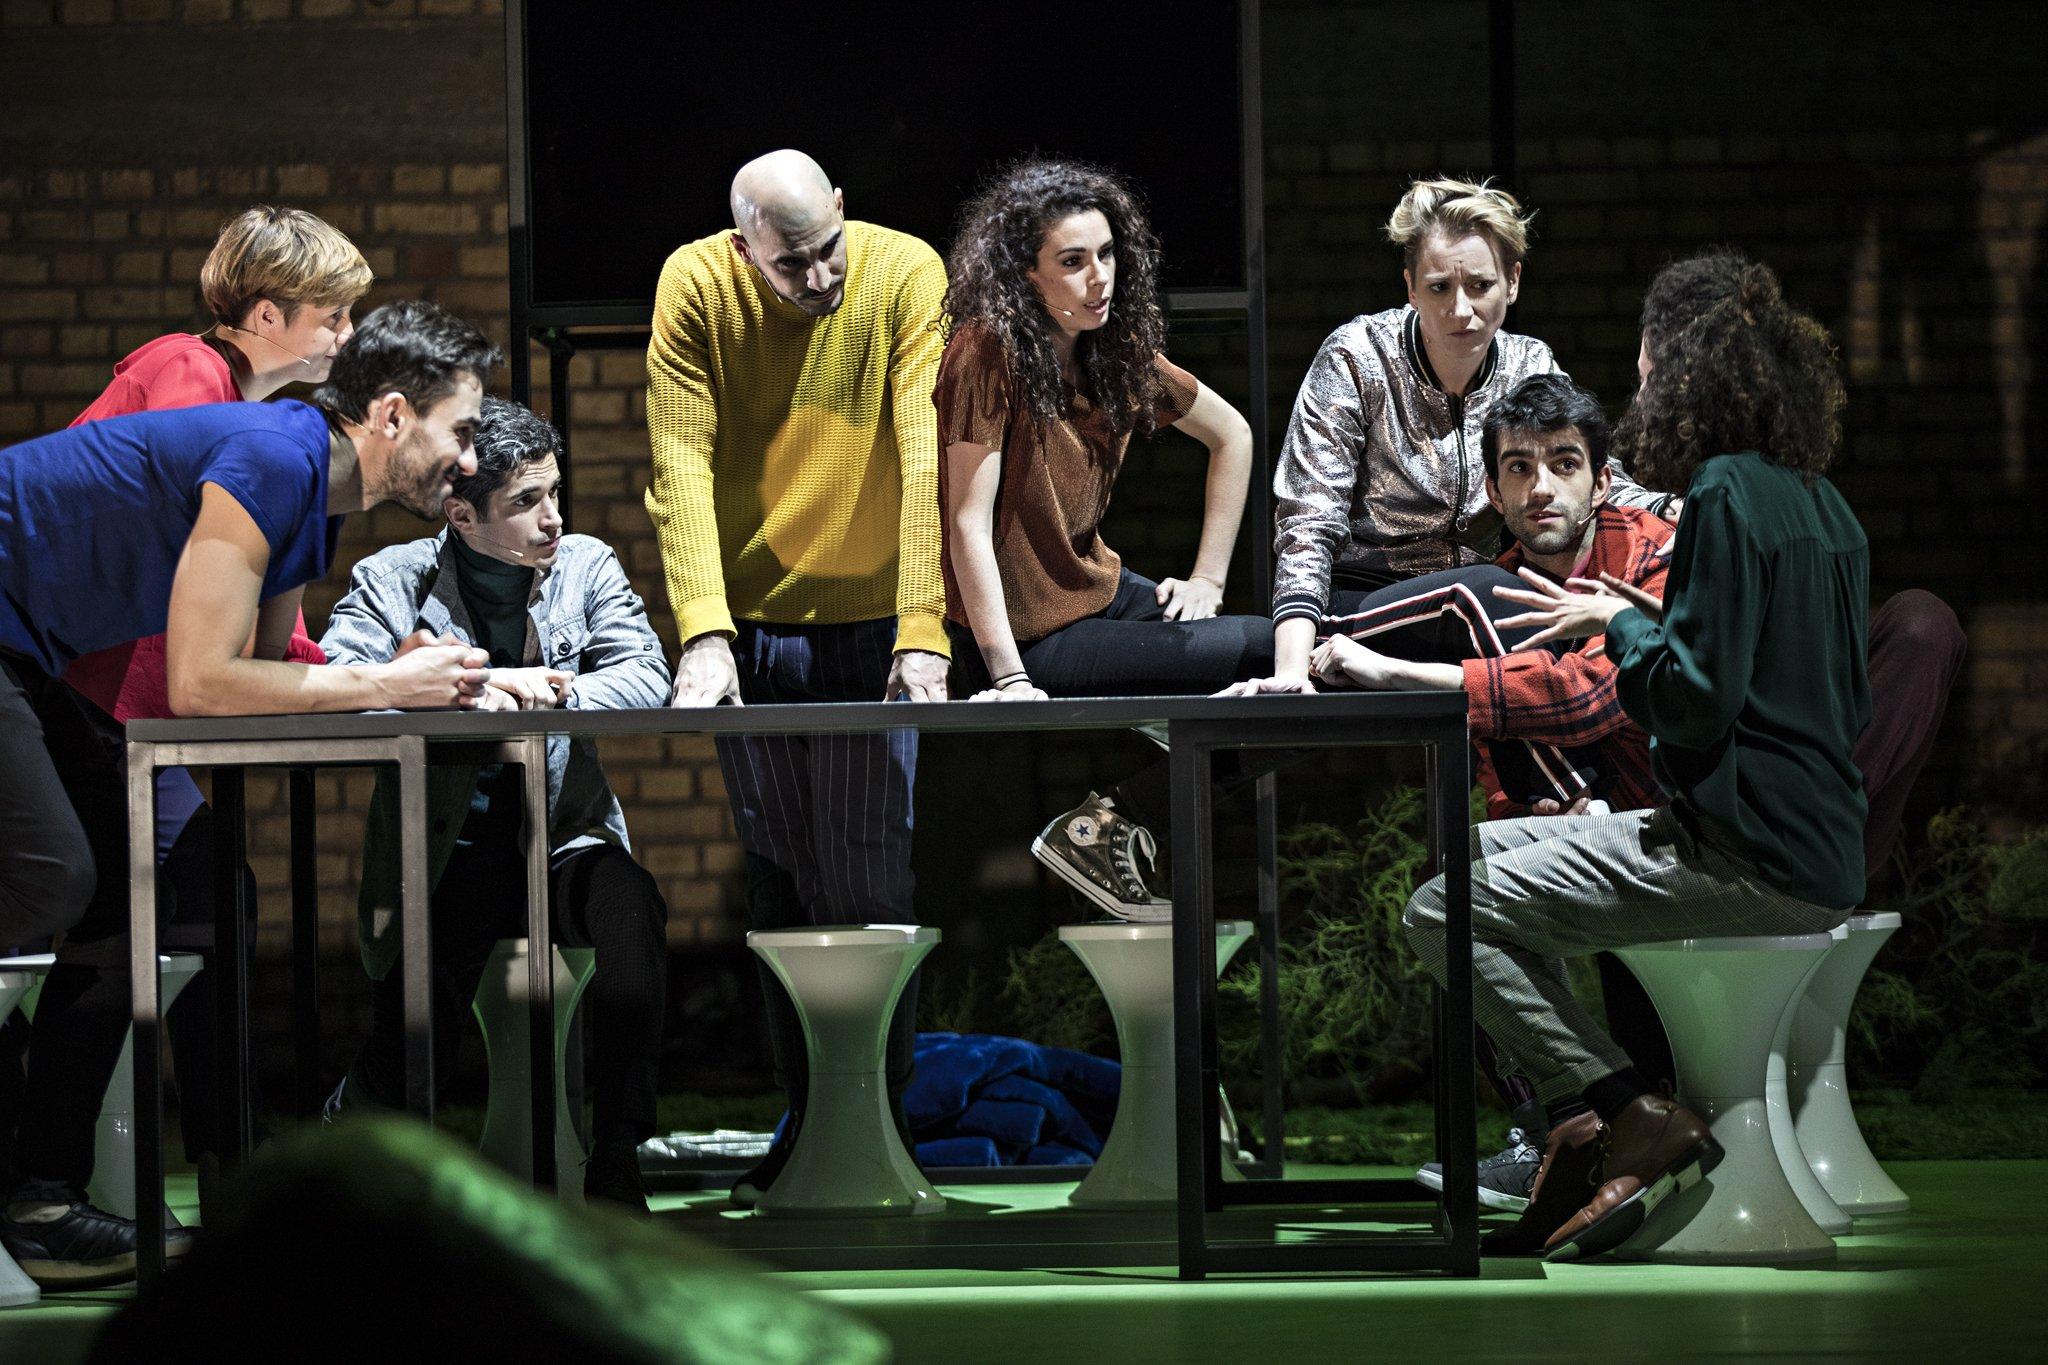 Theatre_I-am-europe_Theatre-de-Liege_Jean-Louis-Fernandez_szenik